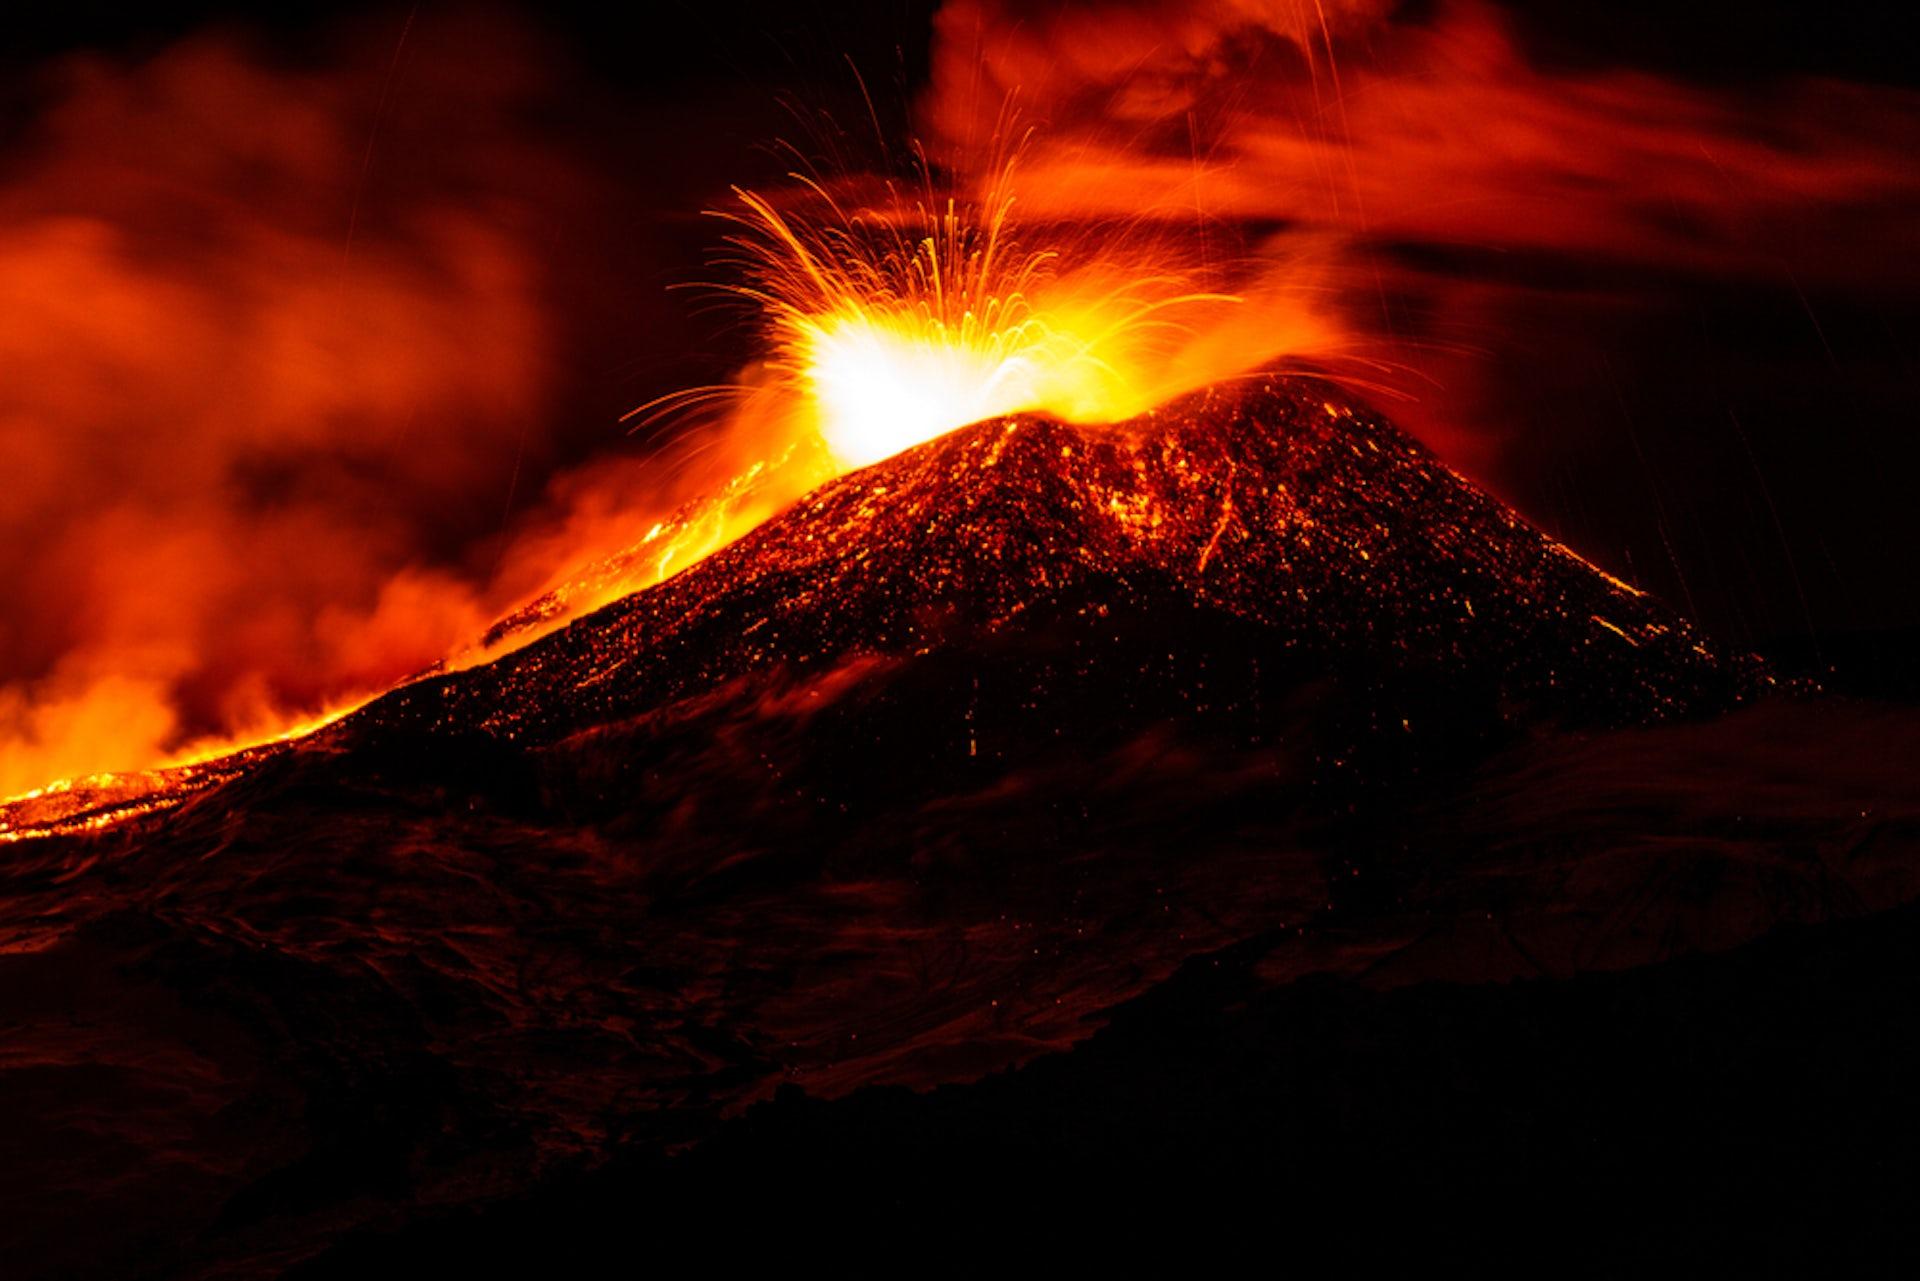 how long did the 1985 nevado del ruiz eruption last